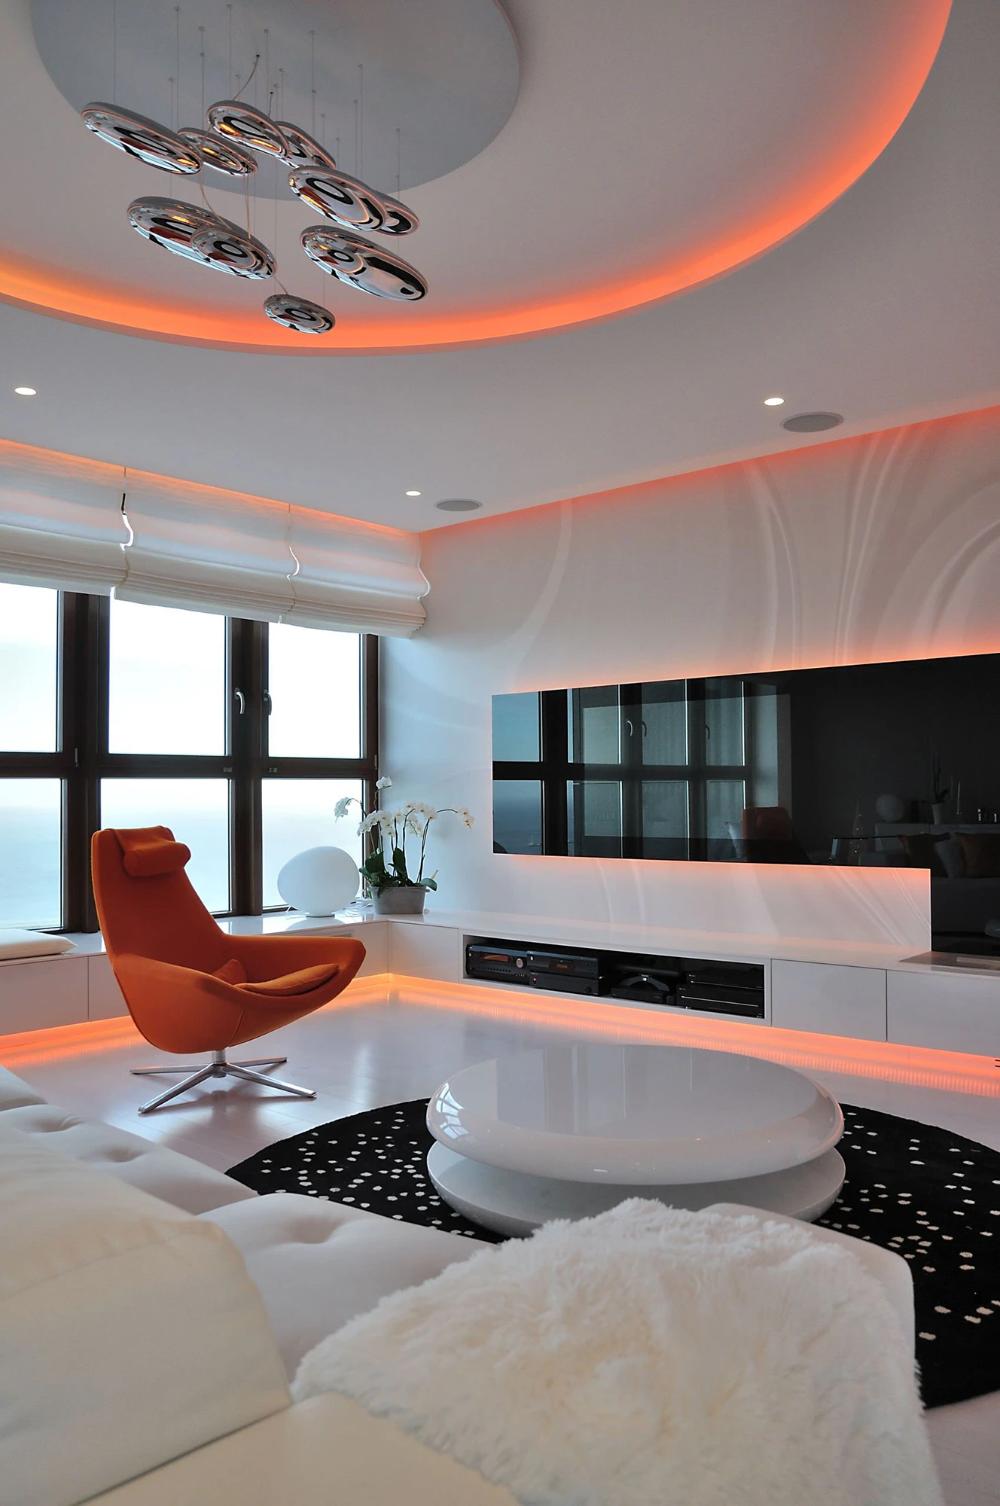 Mercury Collection Replik In 2020 Indirekte Beleuchtung Wohnzimmer Beleuchtung Wohnzimmer Indirekte Beleuchtung